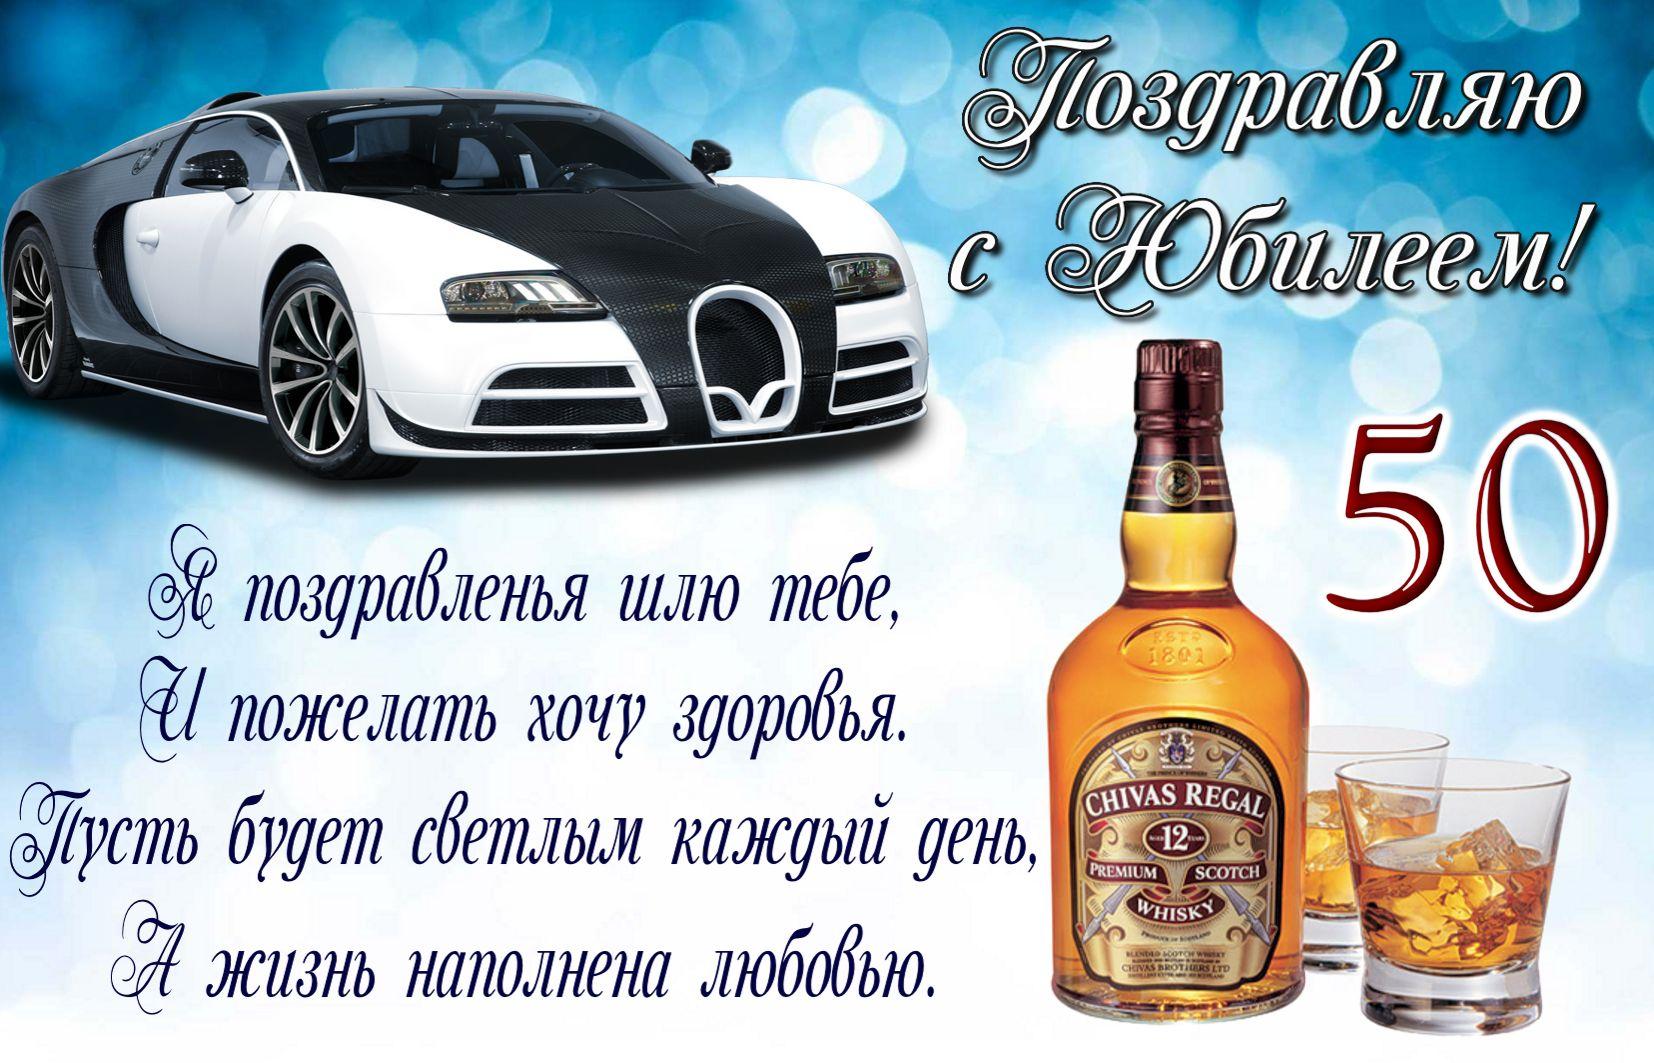 Открытка на юбилей 50 лет - машина, виски и пожелание для мужчины